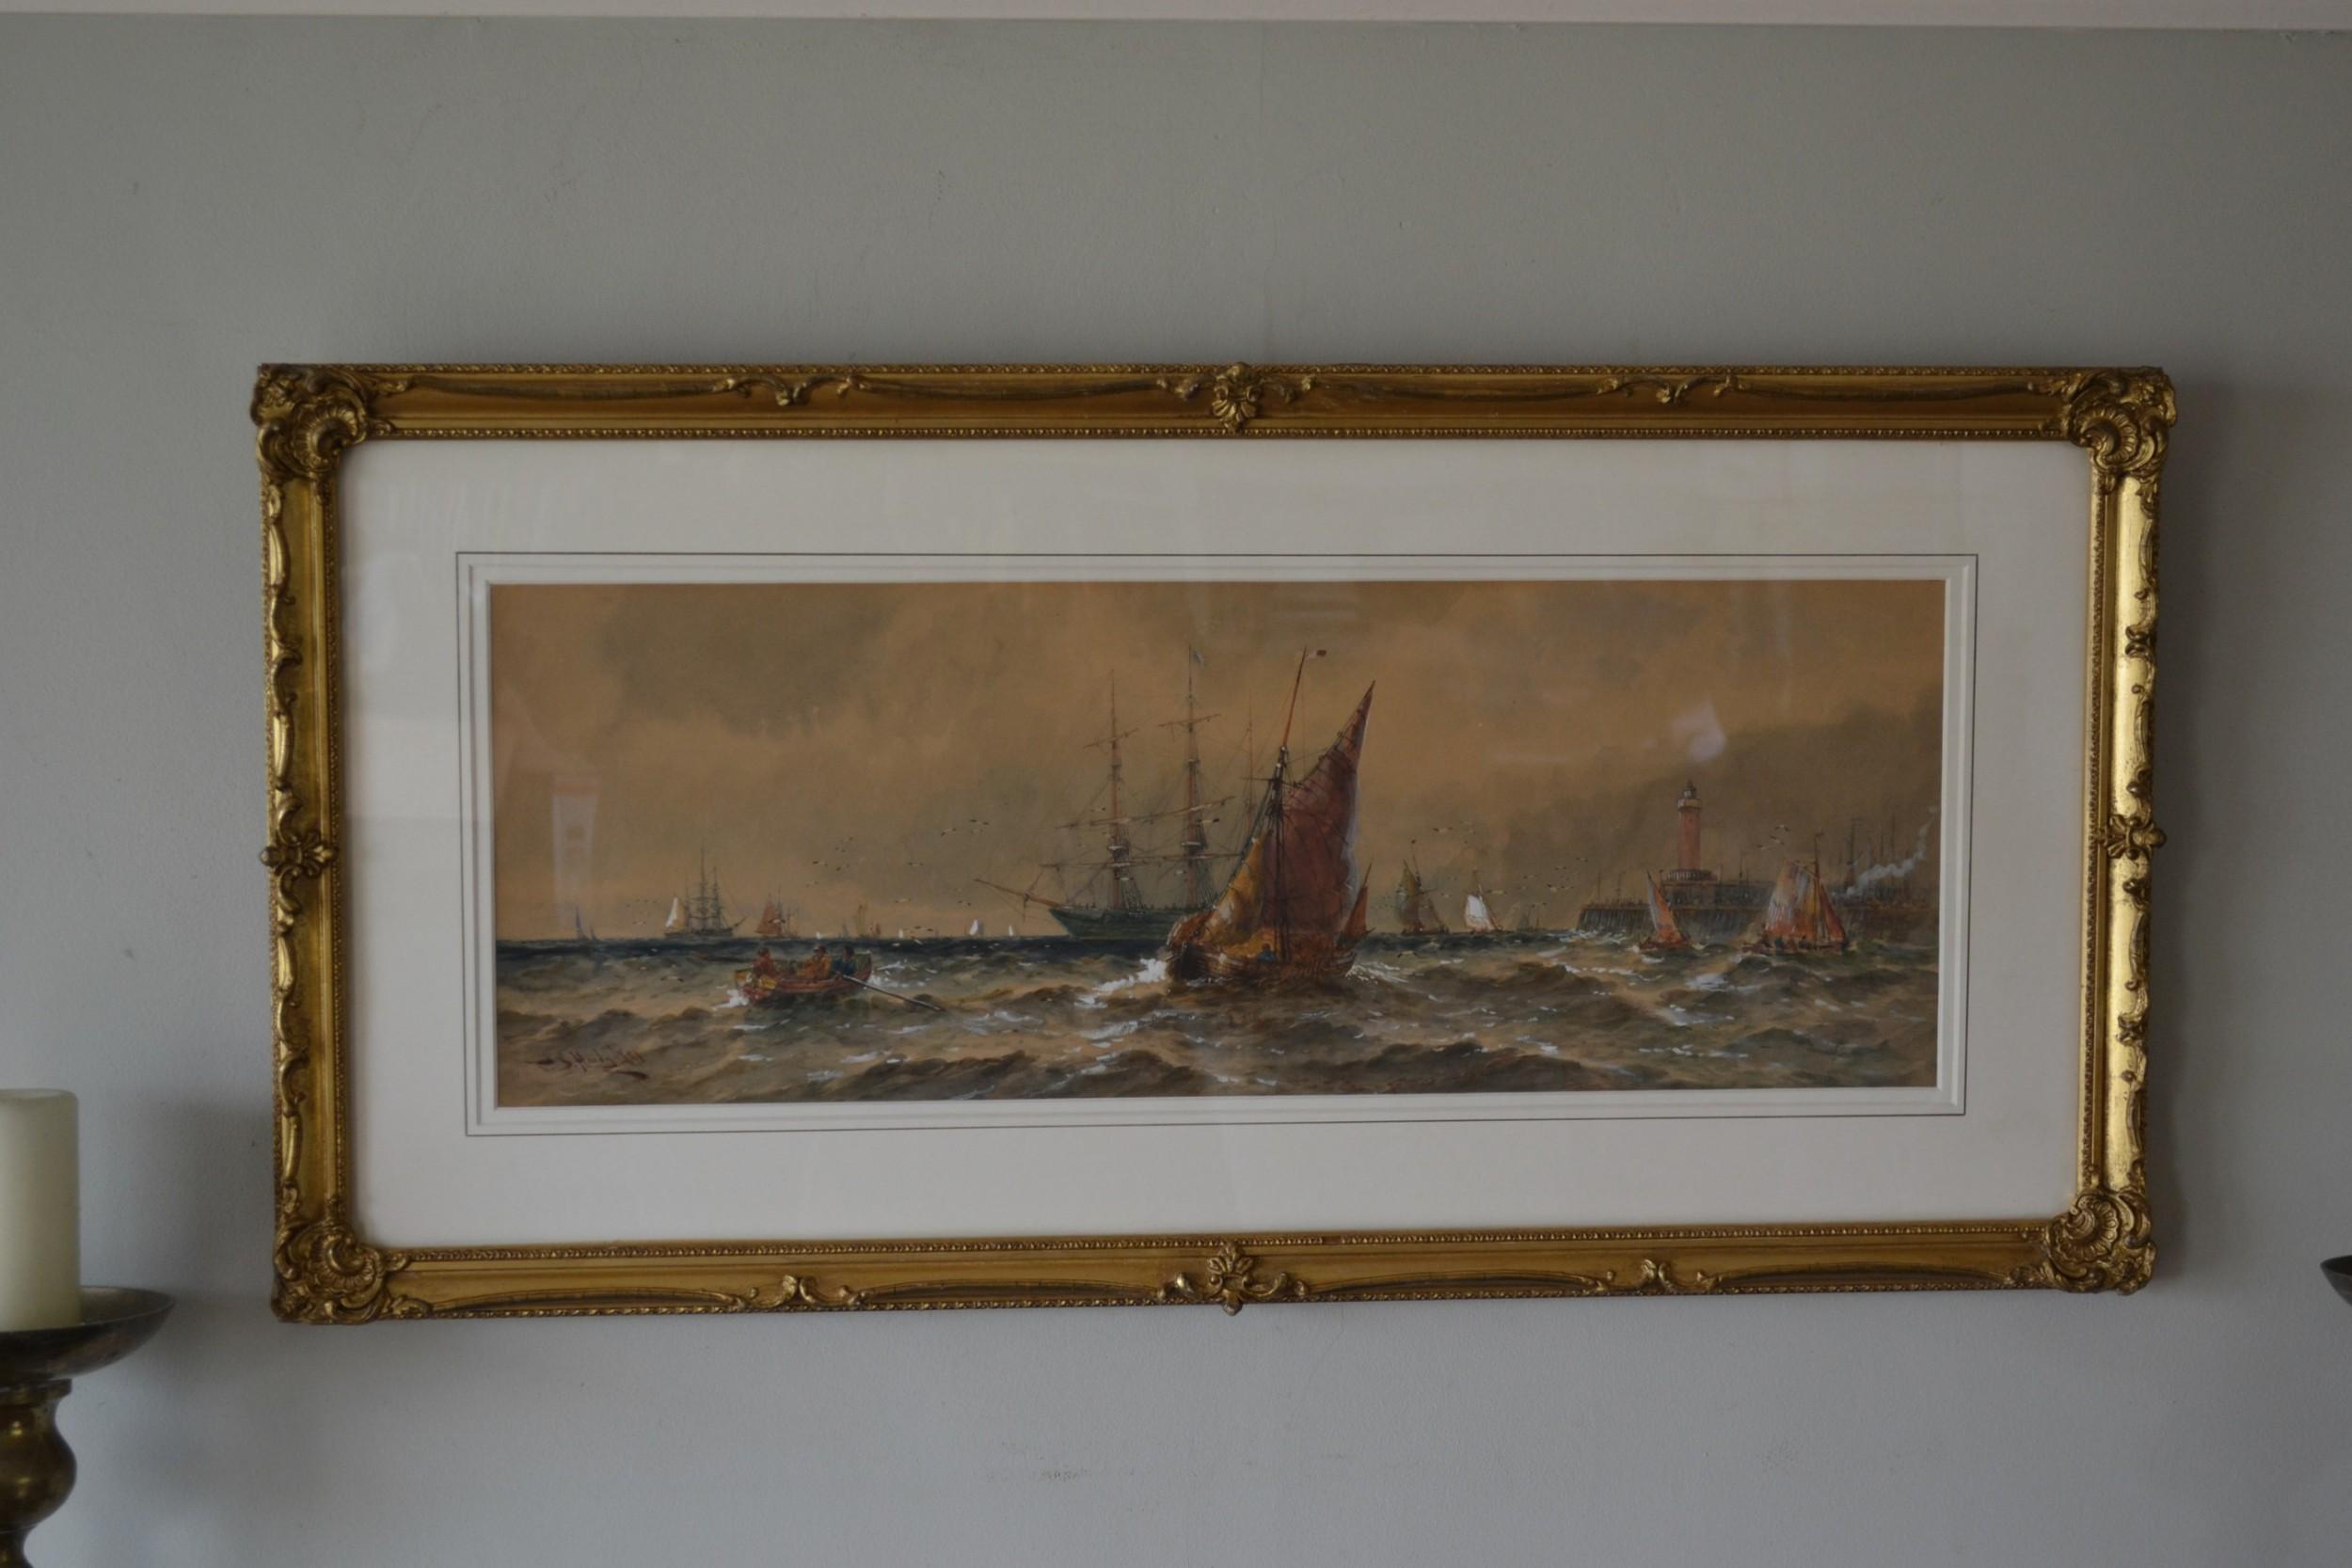 thomas bush hardy rba 1842 1897 shipping leaving calais harbour watercolour 1891